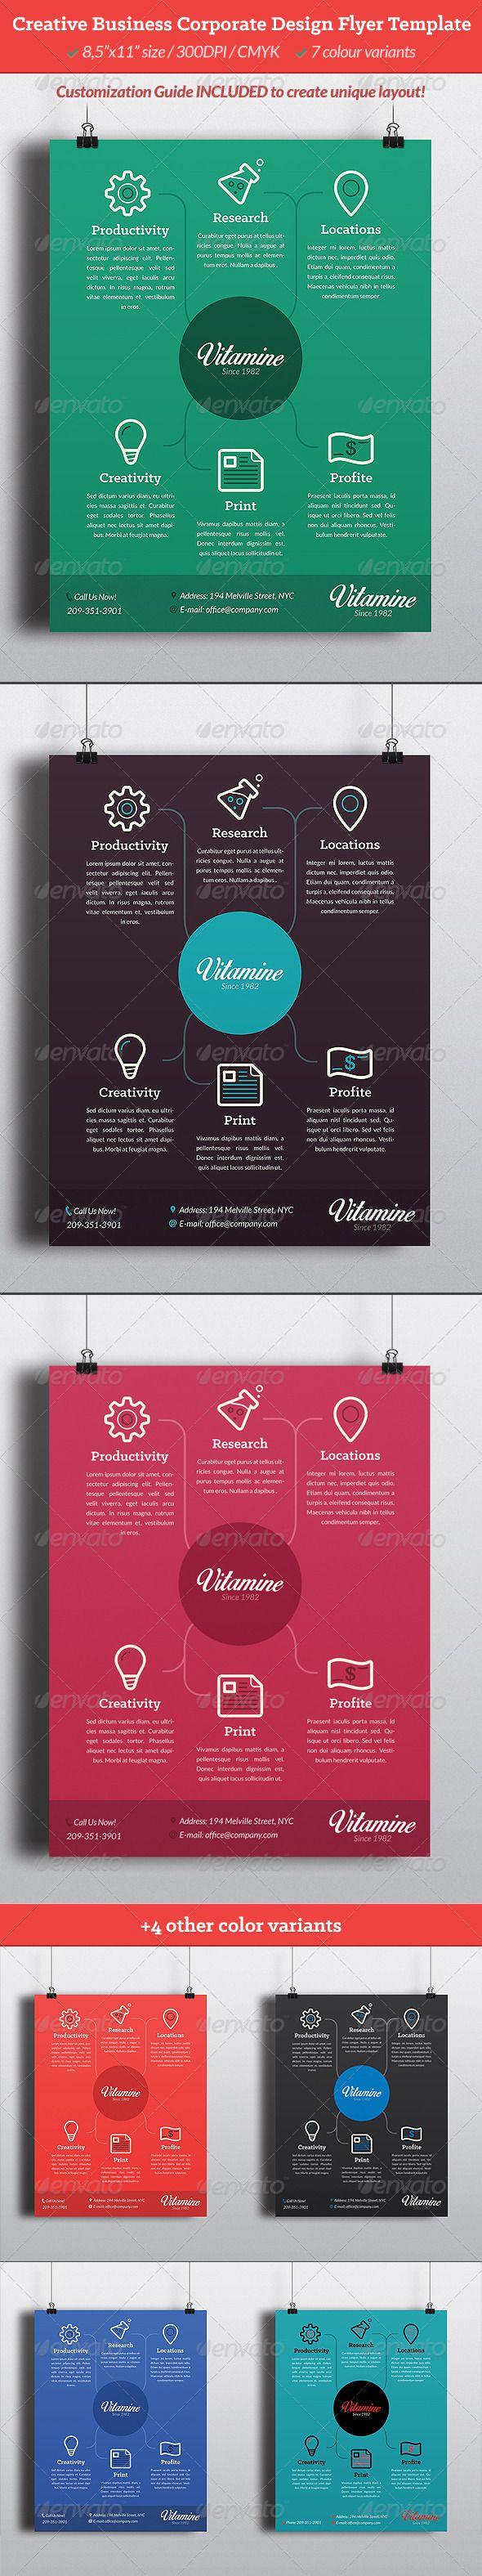 Creative Business Corporate Design Flyer Template | Kreativ, Flyer ...